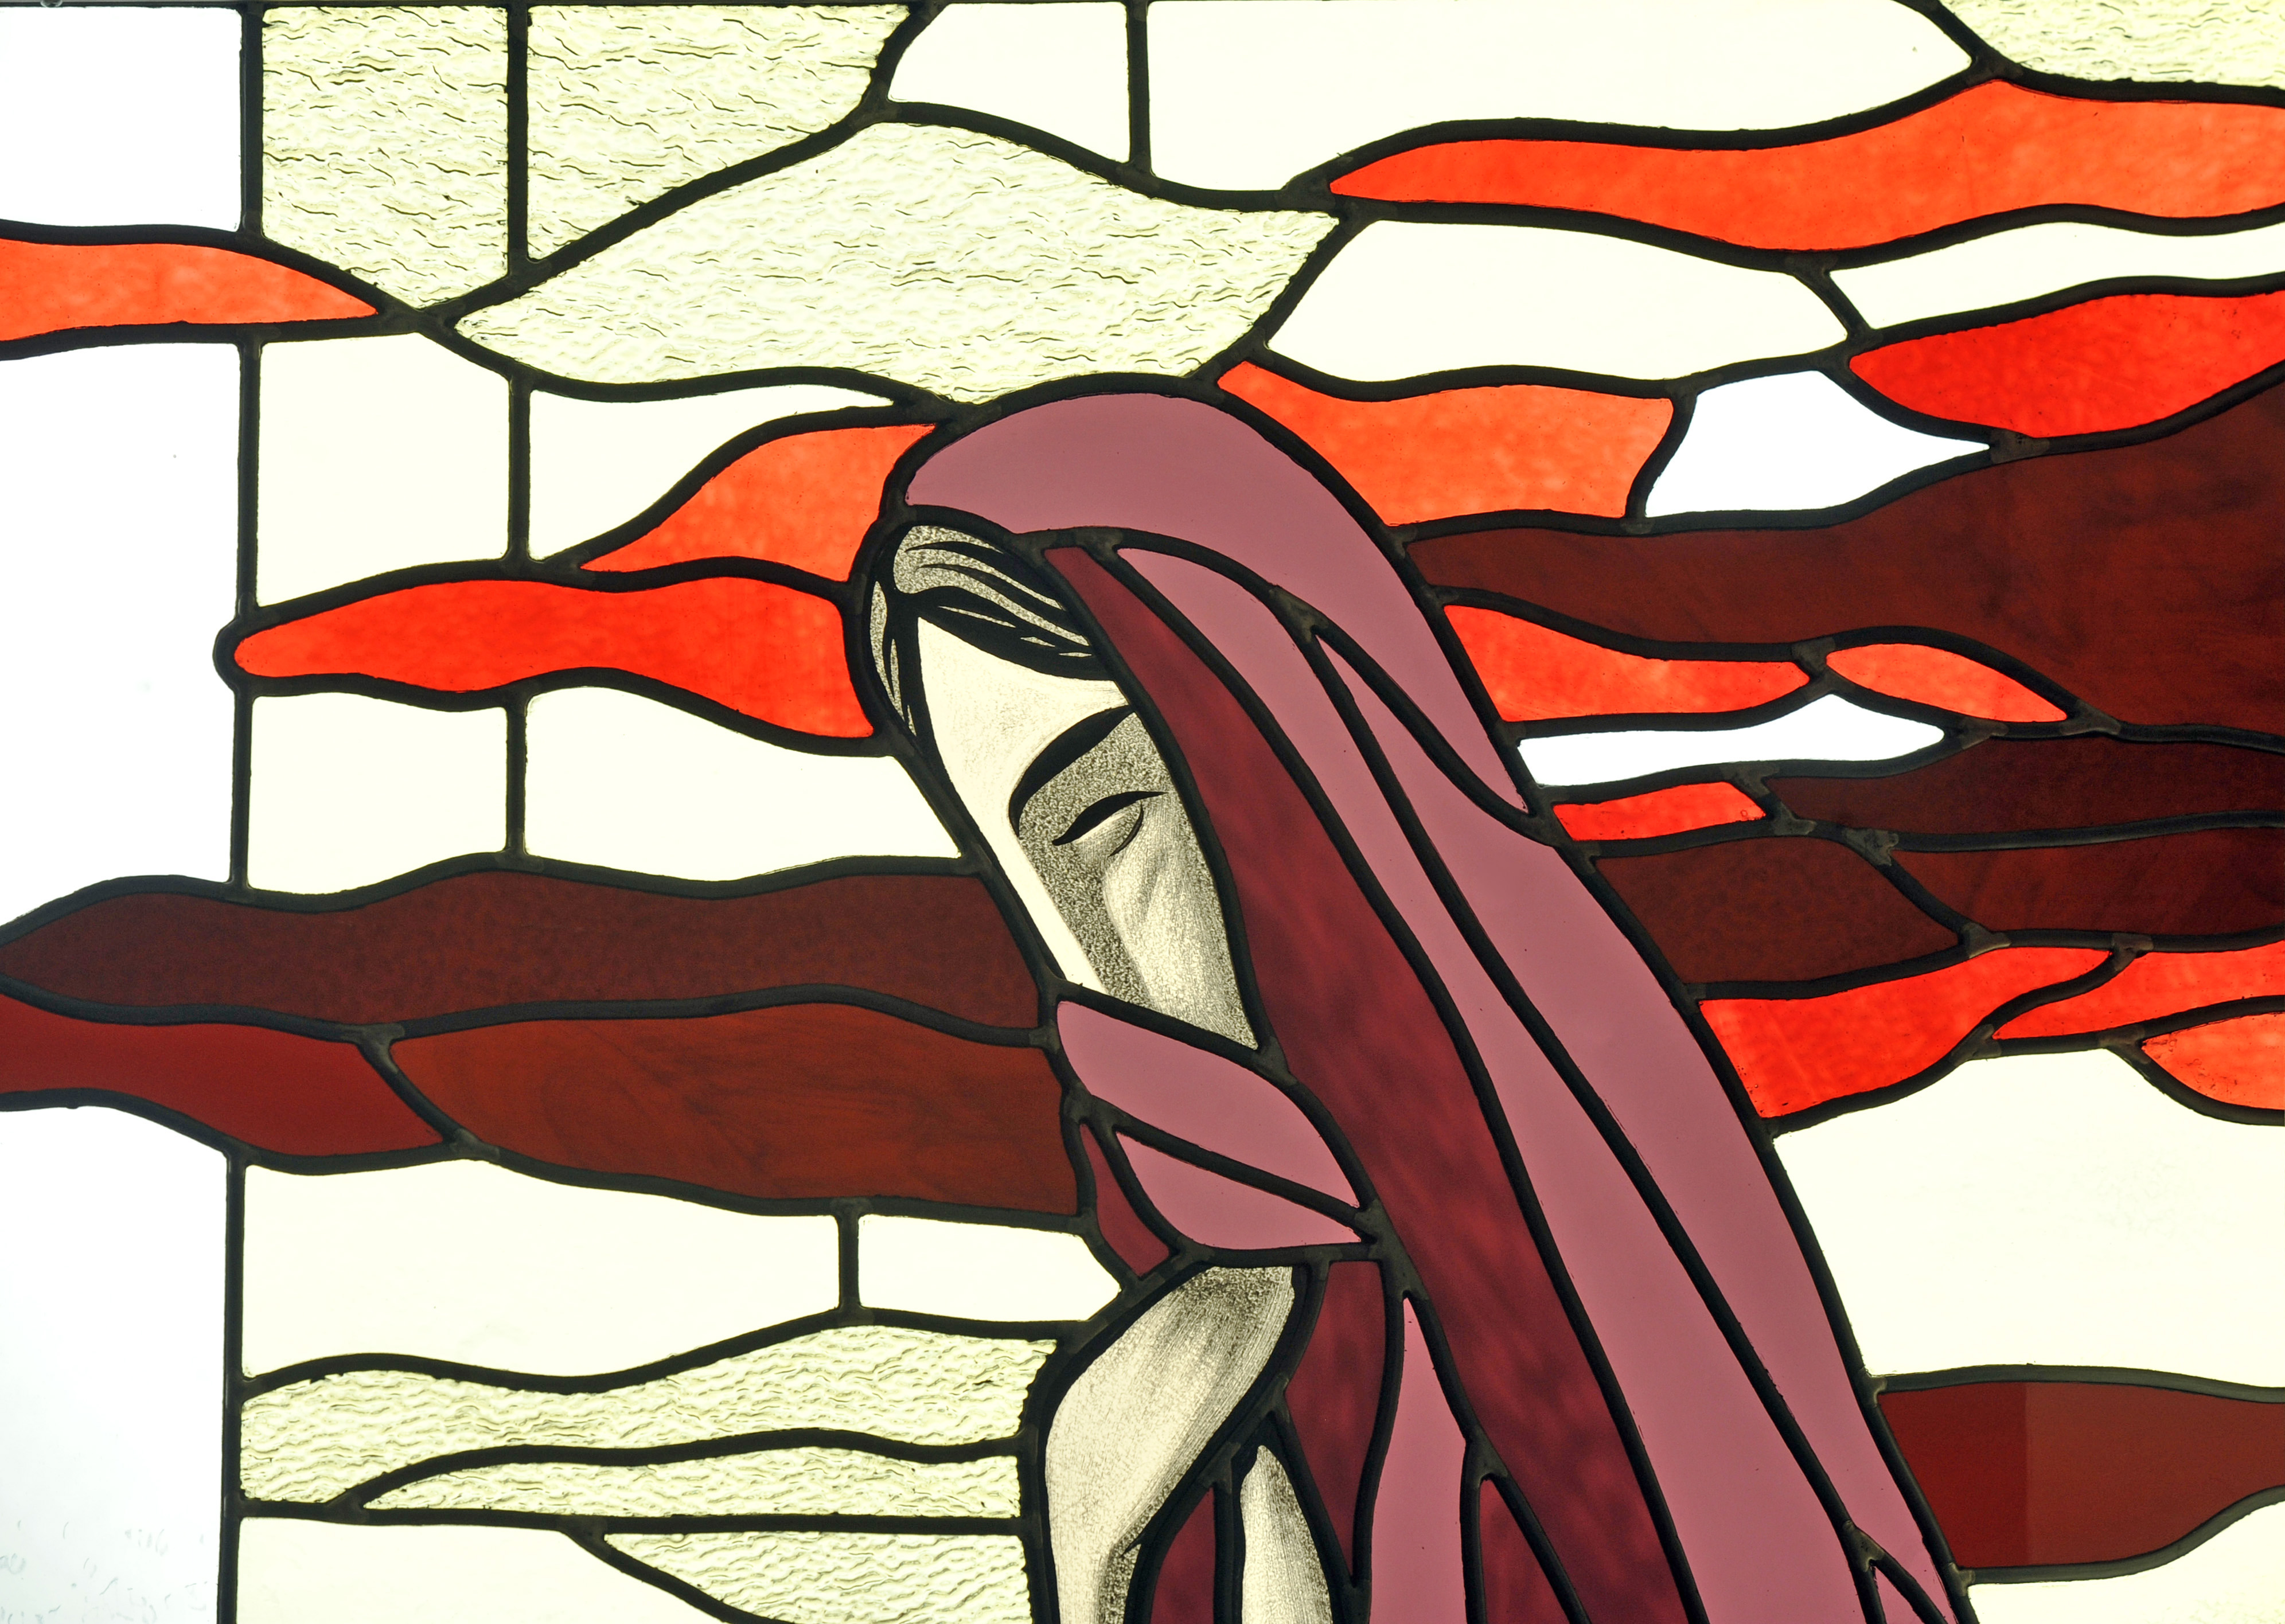 Cross stained-glass window